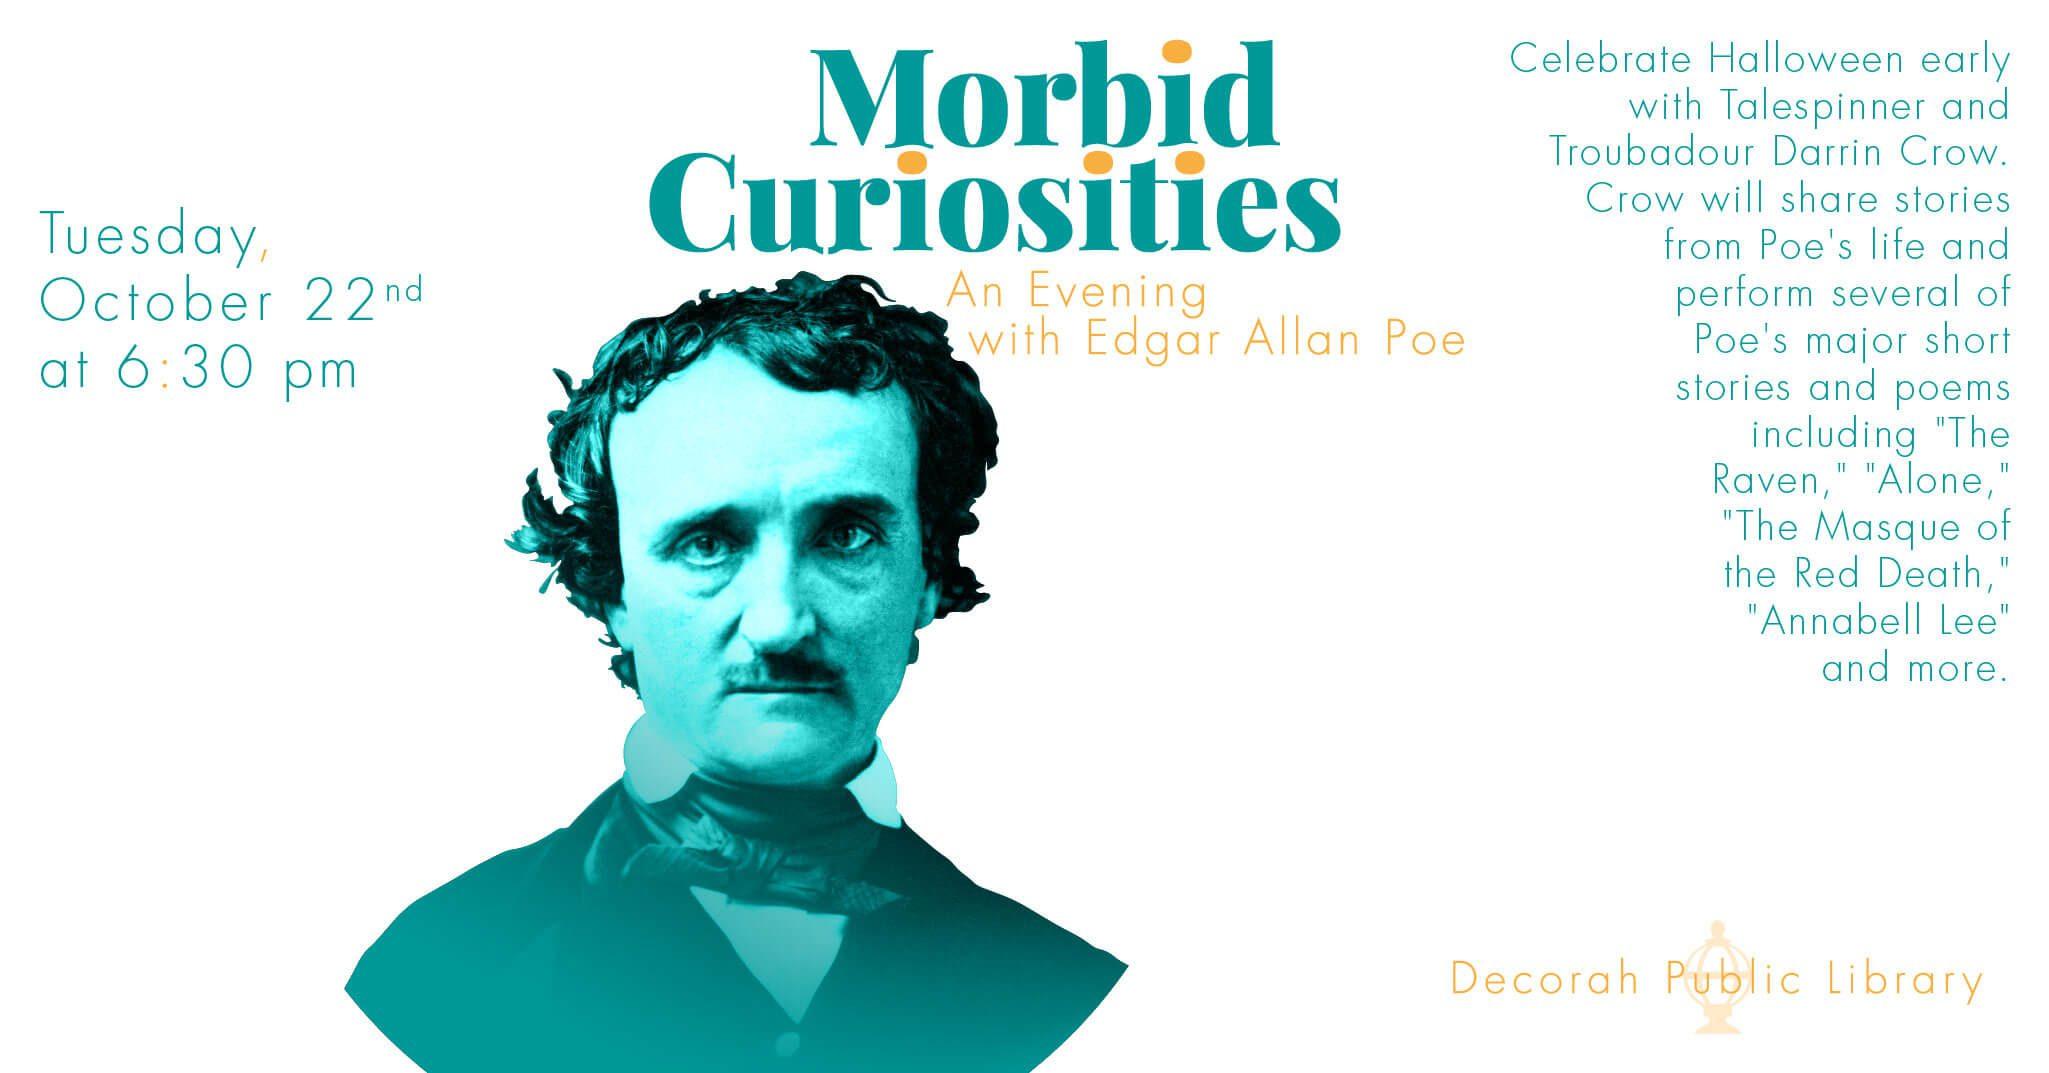 Morbid Curiosties October 22